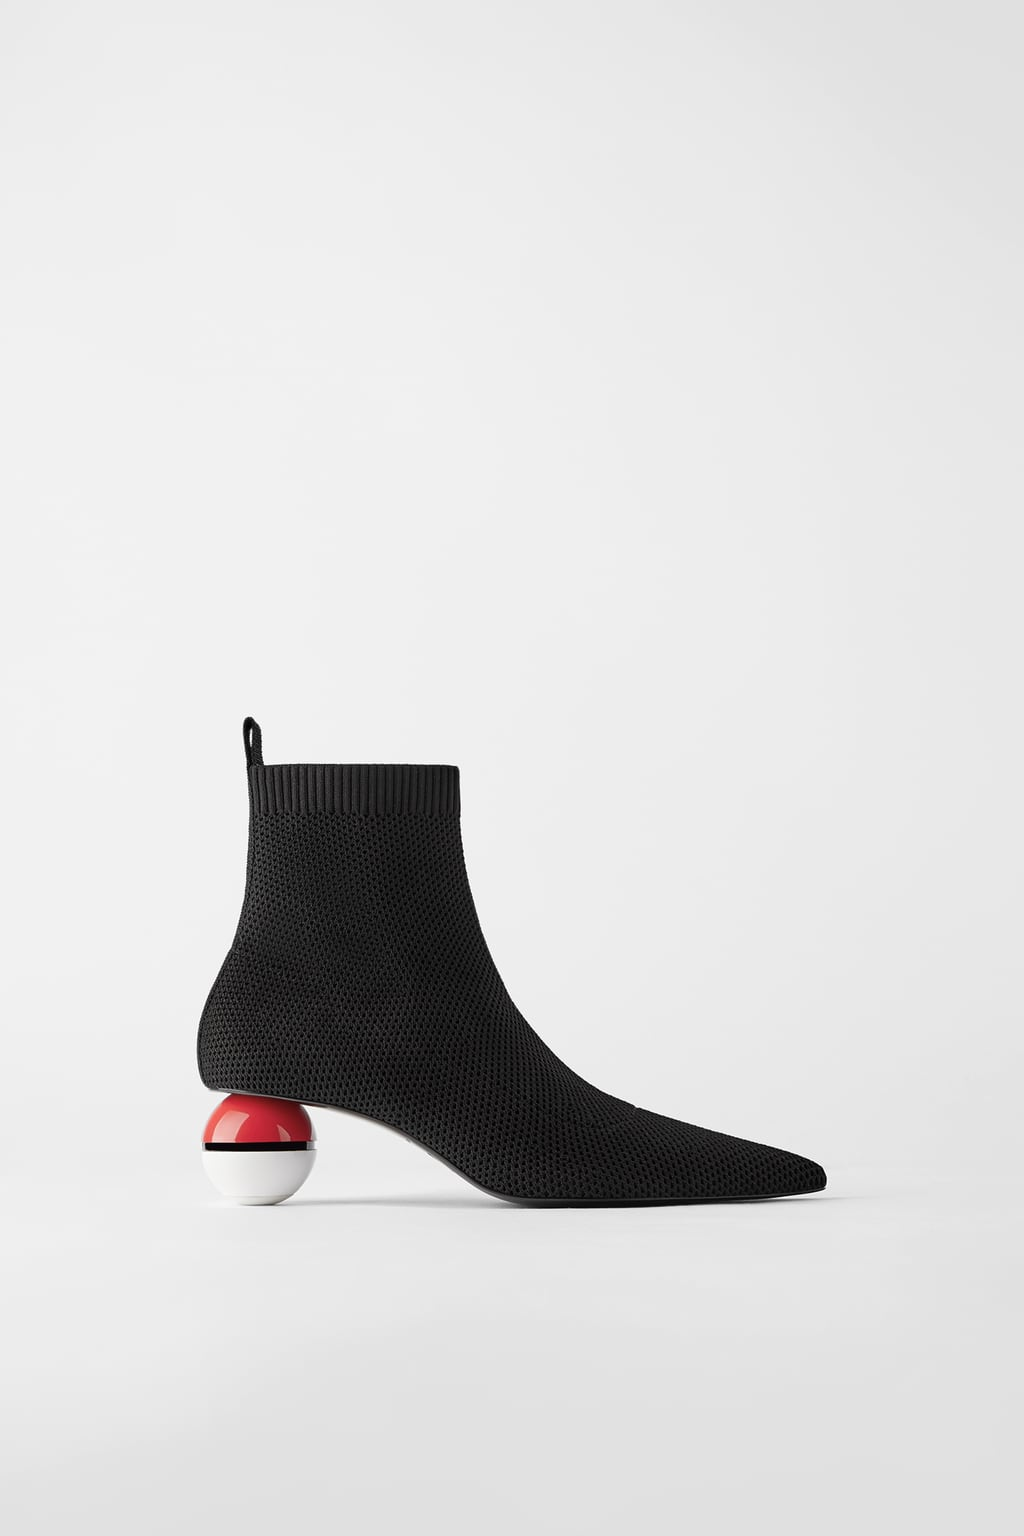 ZARA推「寳可夢短靴」造型超前衛 鞋跟踩著「神奇寶貝球」網超不解:時尚好難懂!